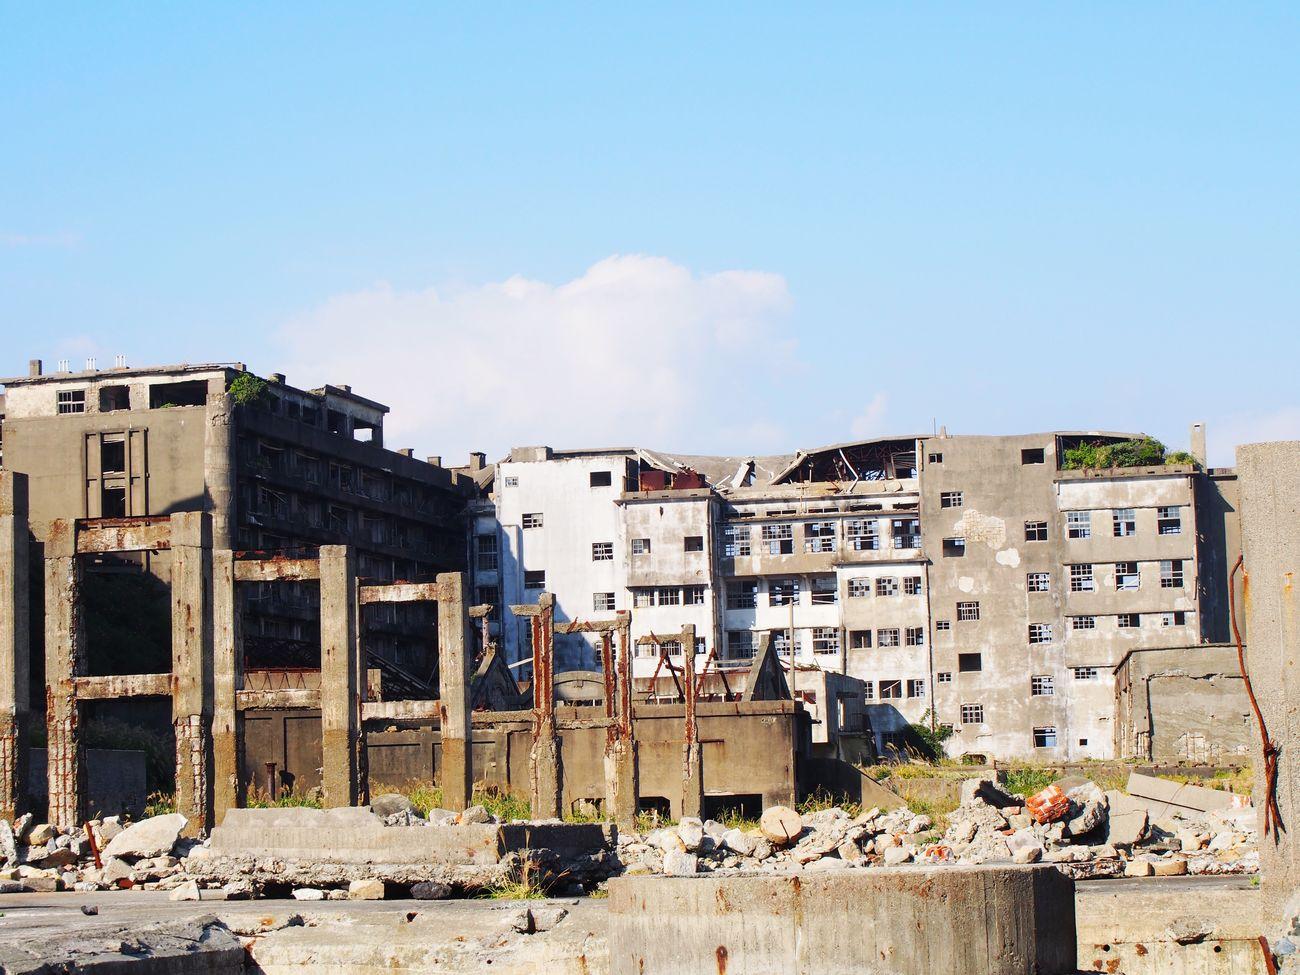 Nagasaki JAPAN 長崎 軍艦島(gunkan-jima)